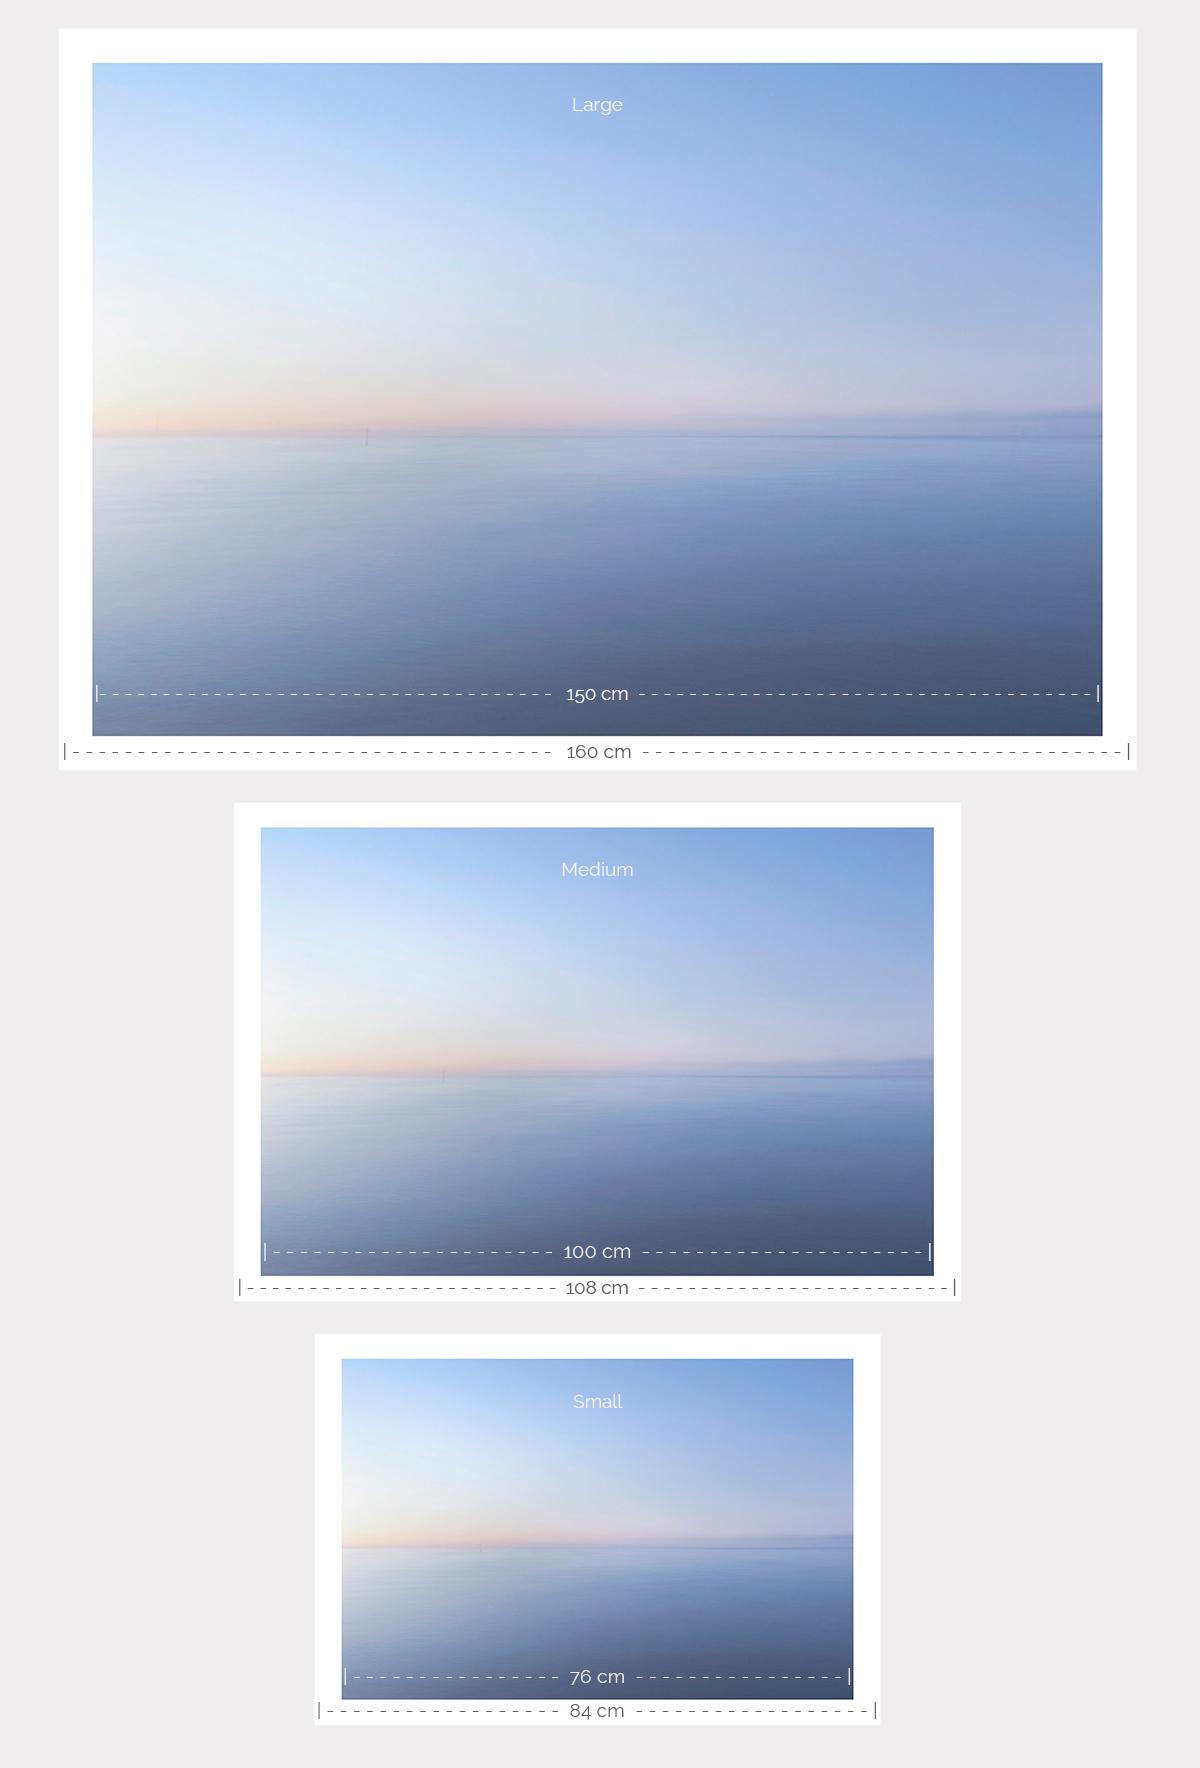 is-joanne-piechota-daybreak-photographic-art